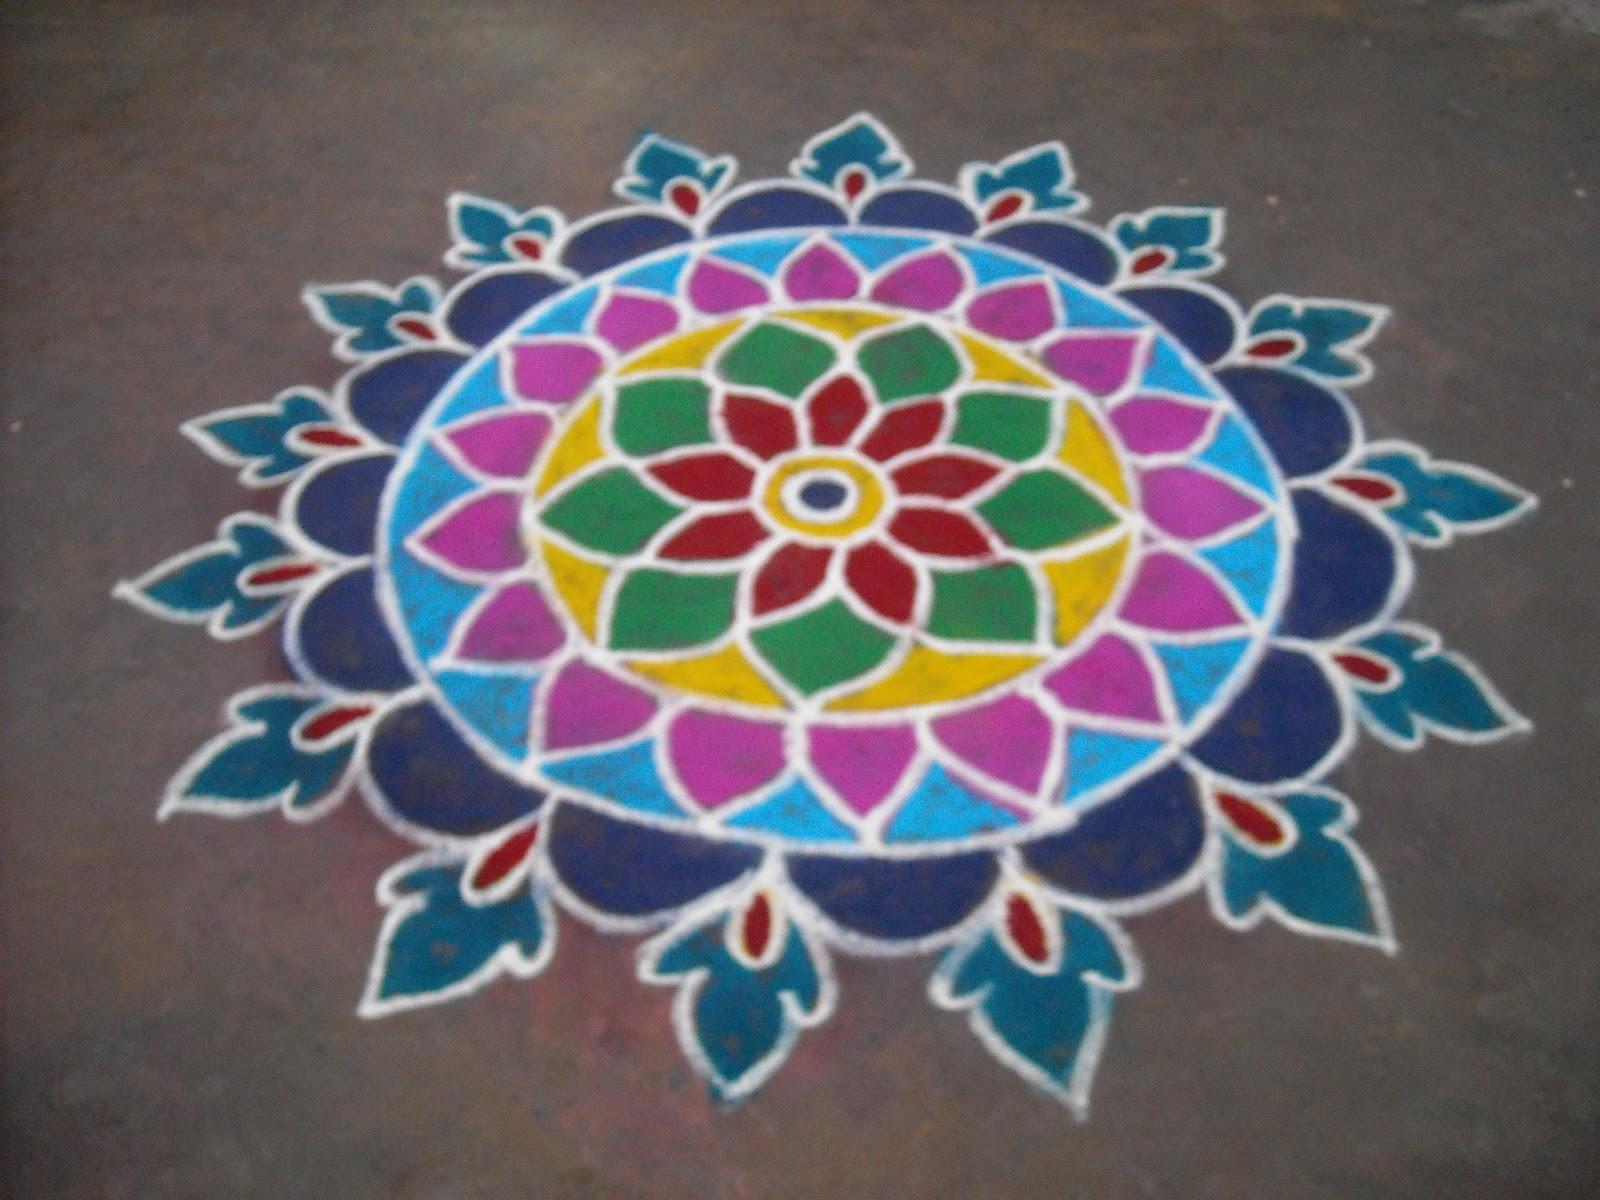 ... jpeg 309kB, Latest 2013 Sankranthi Muggulu Designs | Srilatha Muggulu